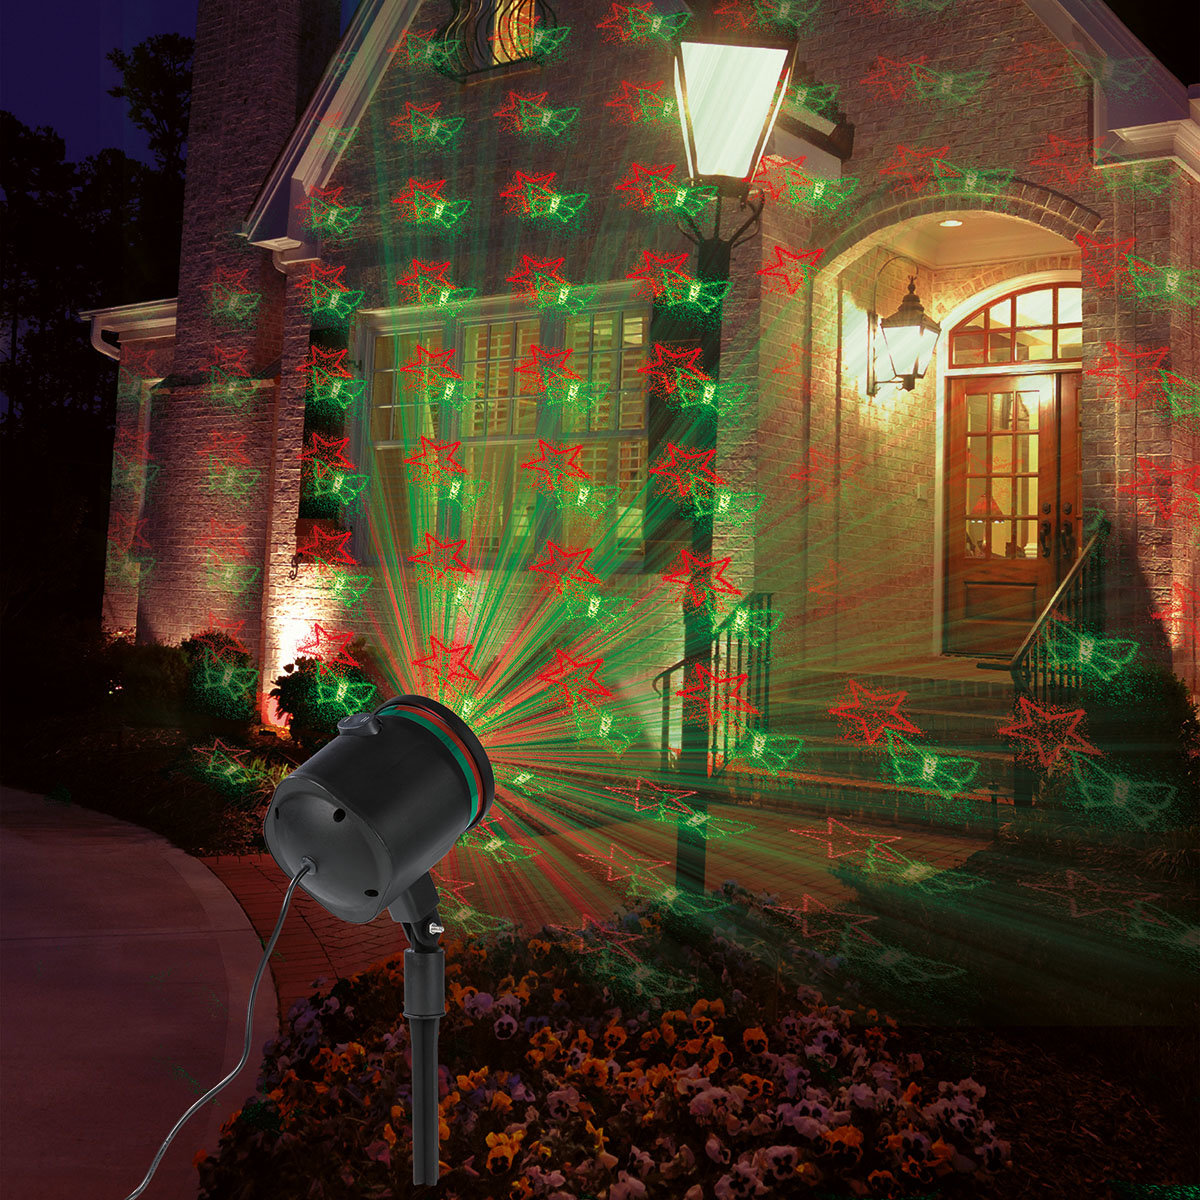 Easymaxx motiv laserstrahler von g rtner p tschke for Gartendeko neuheiten